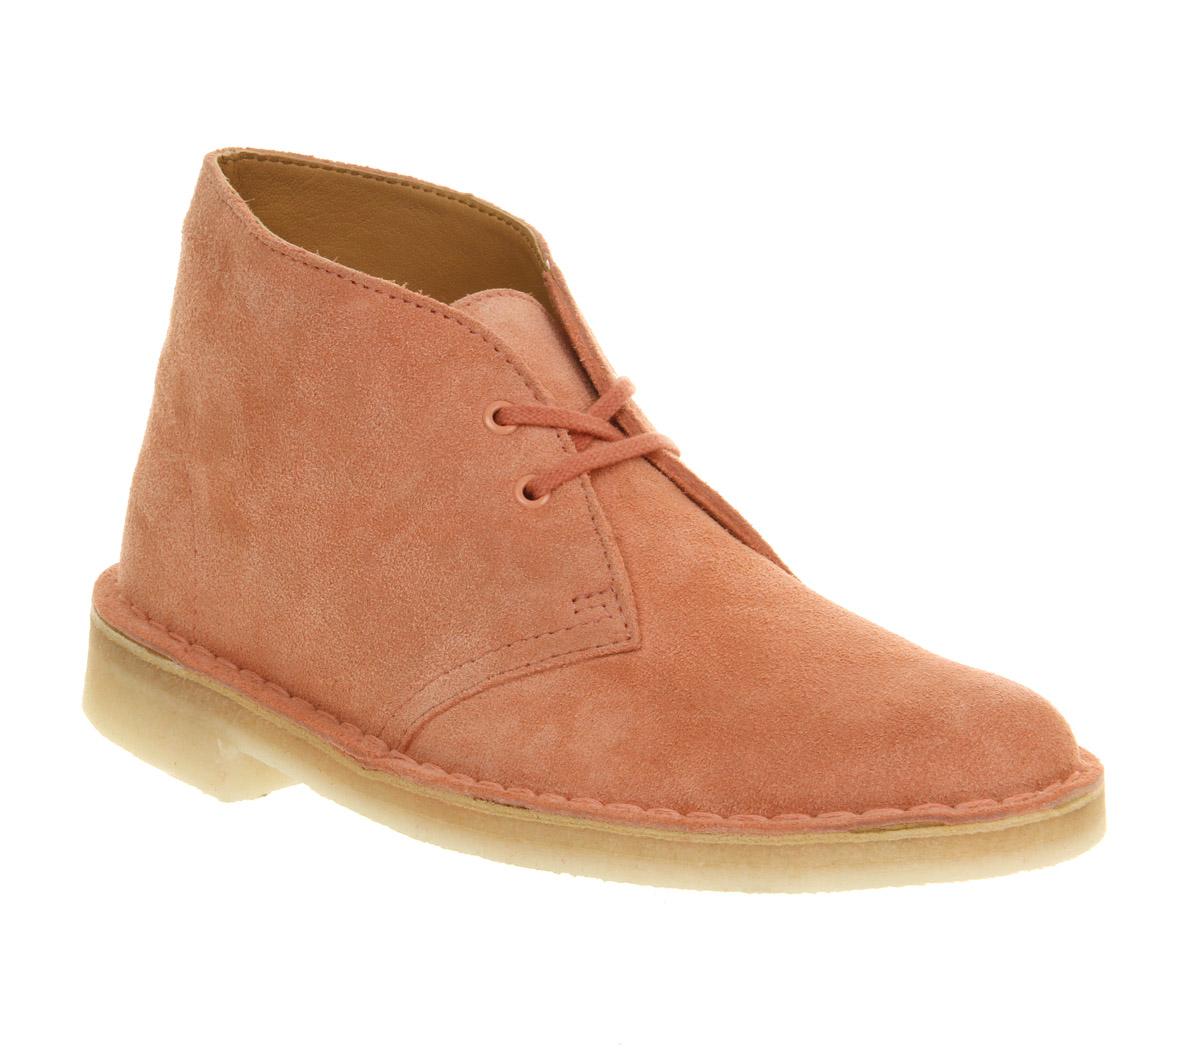 womens clarks originals desert boot dusty pink suede boots